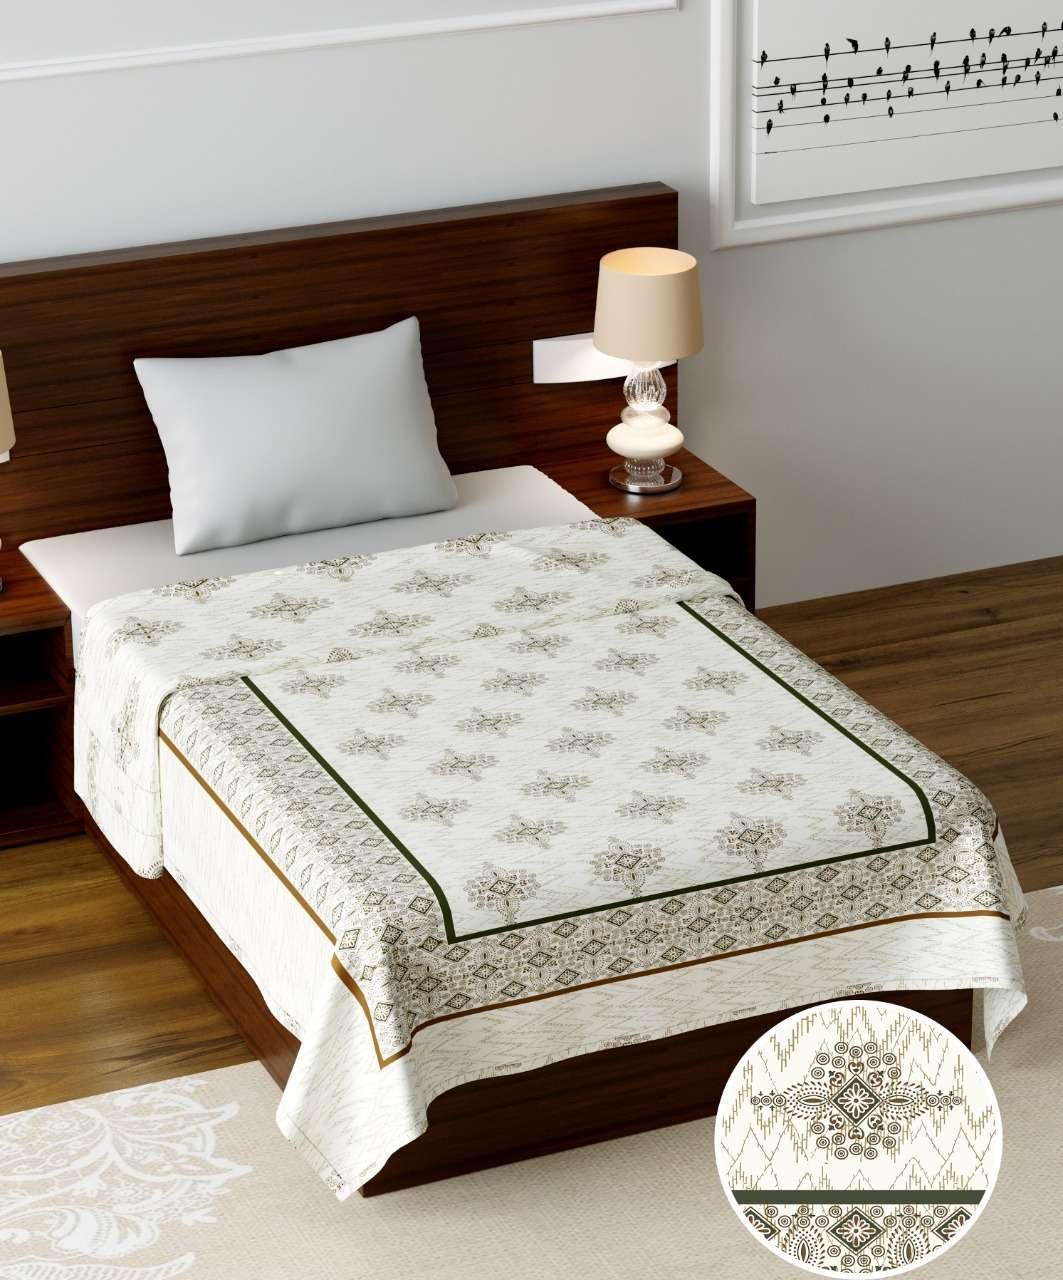 k4u present desire cambric cotton double bed dohar designs collection